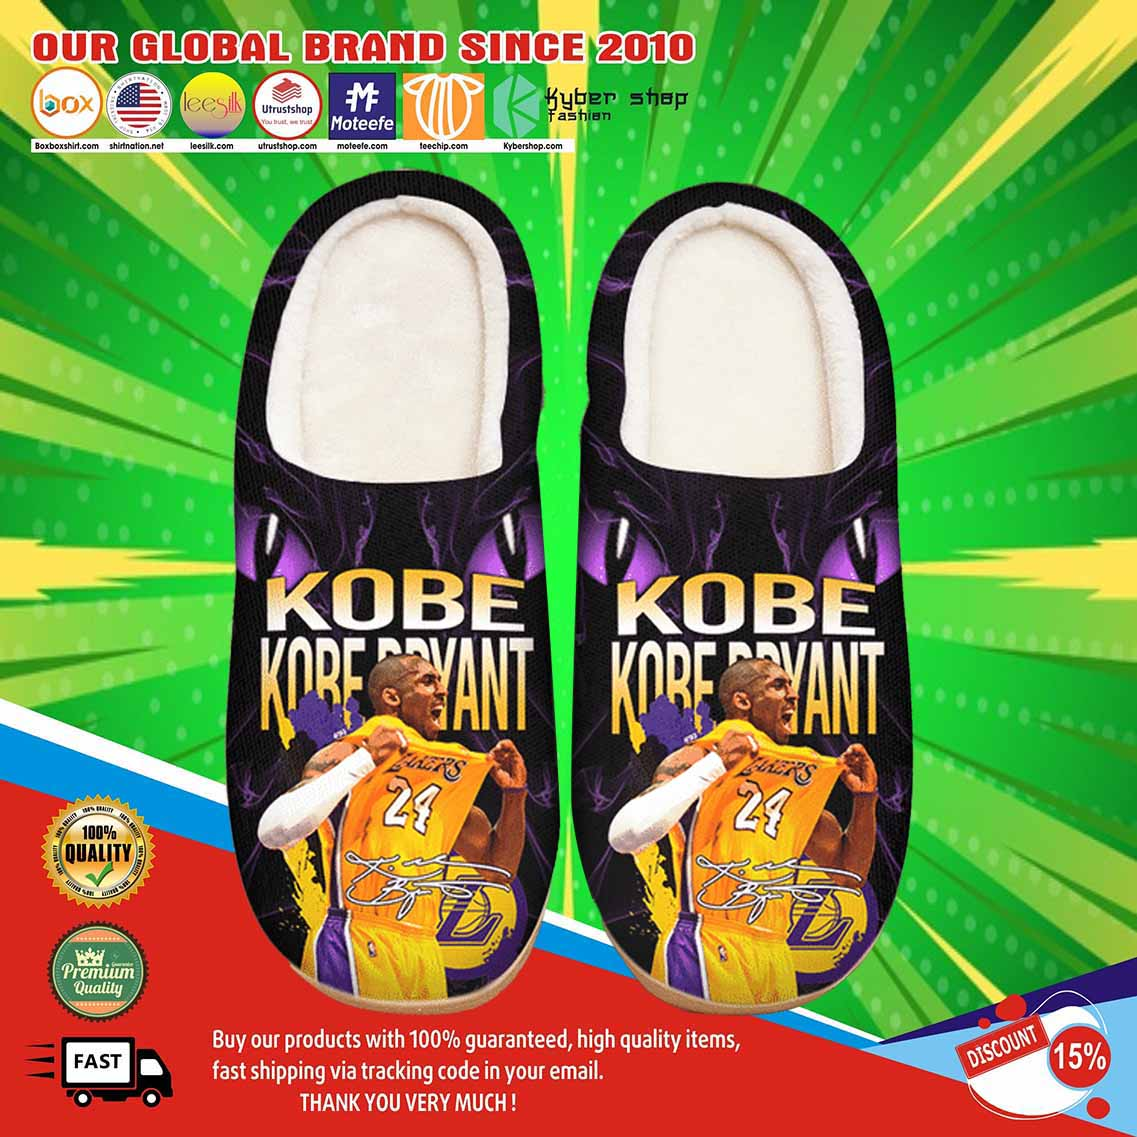 Kobe Bryant Custom Shoes Slippers 3